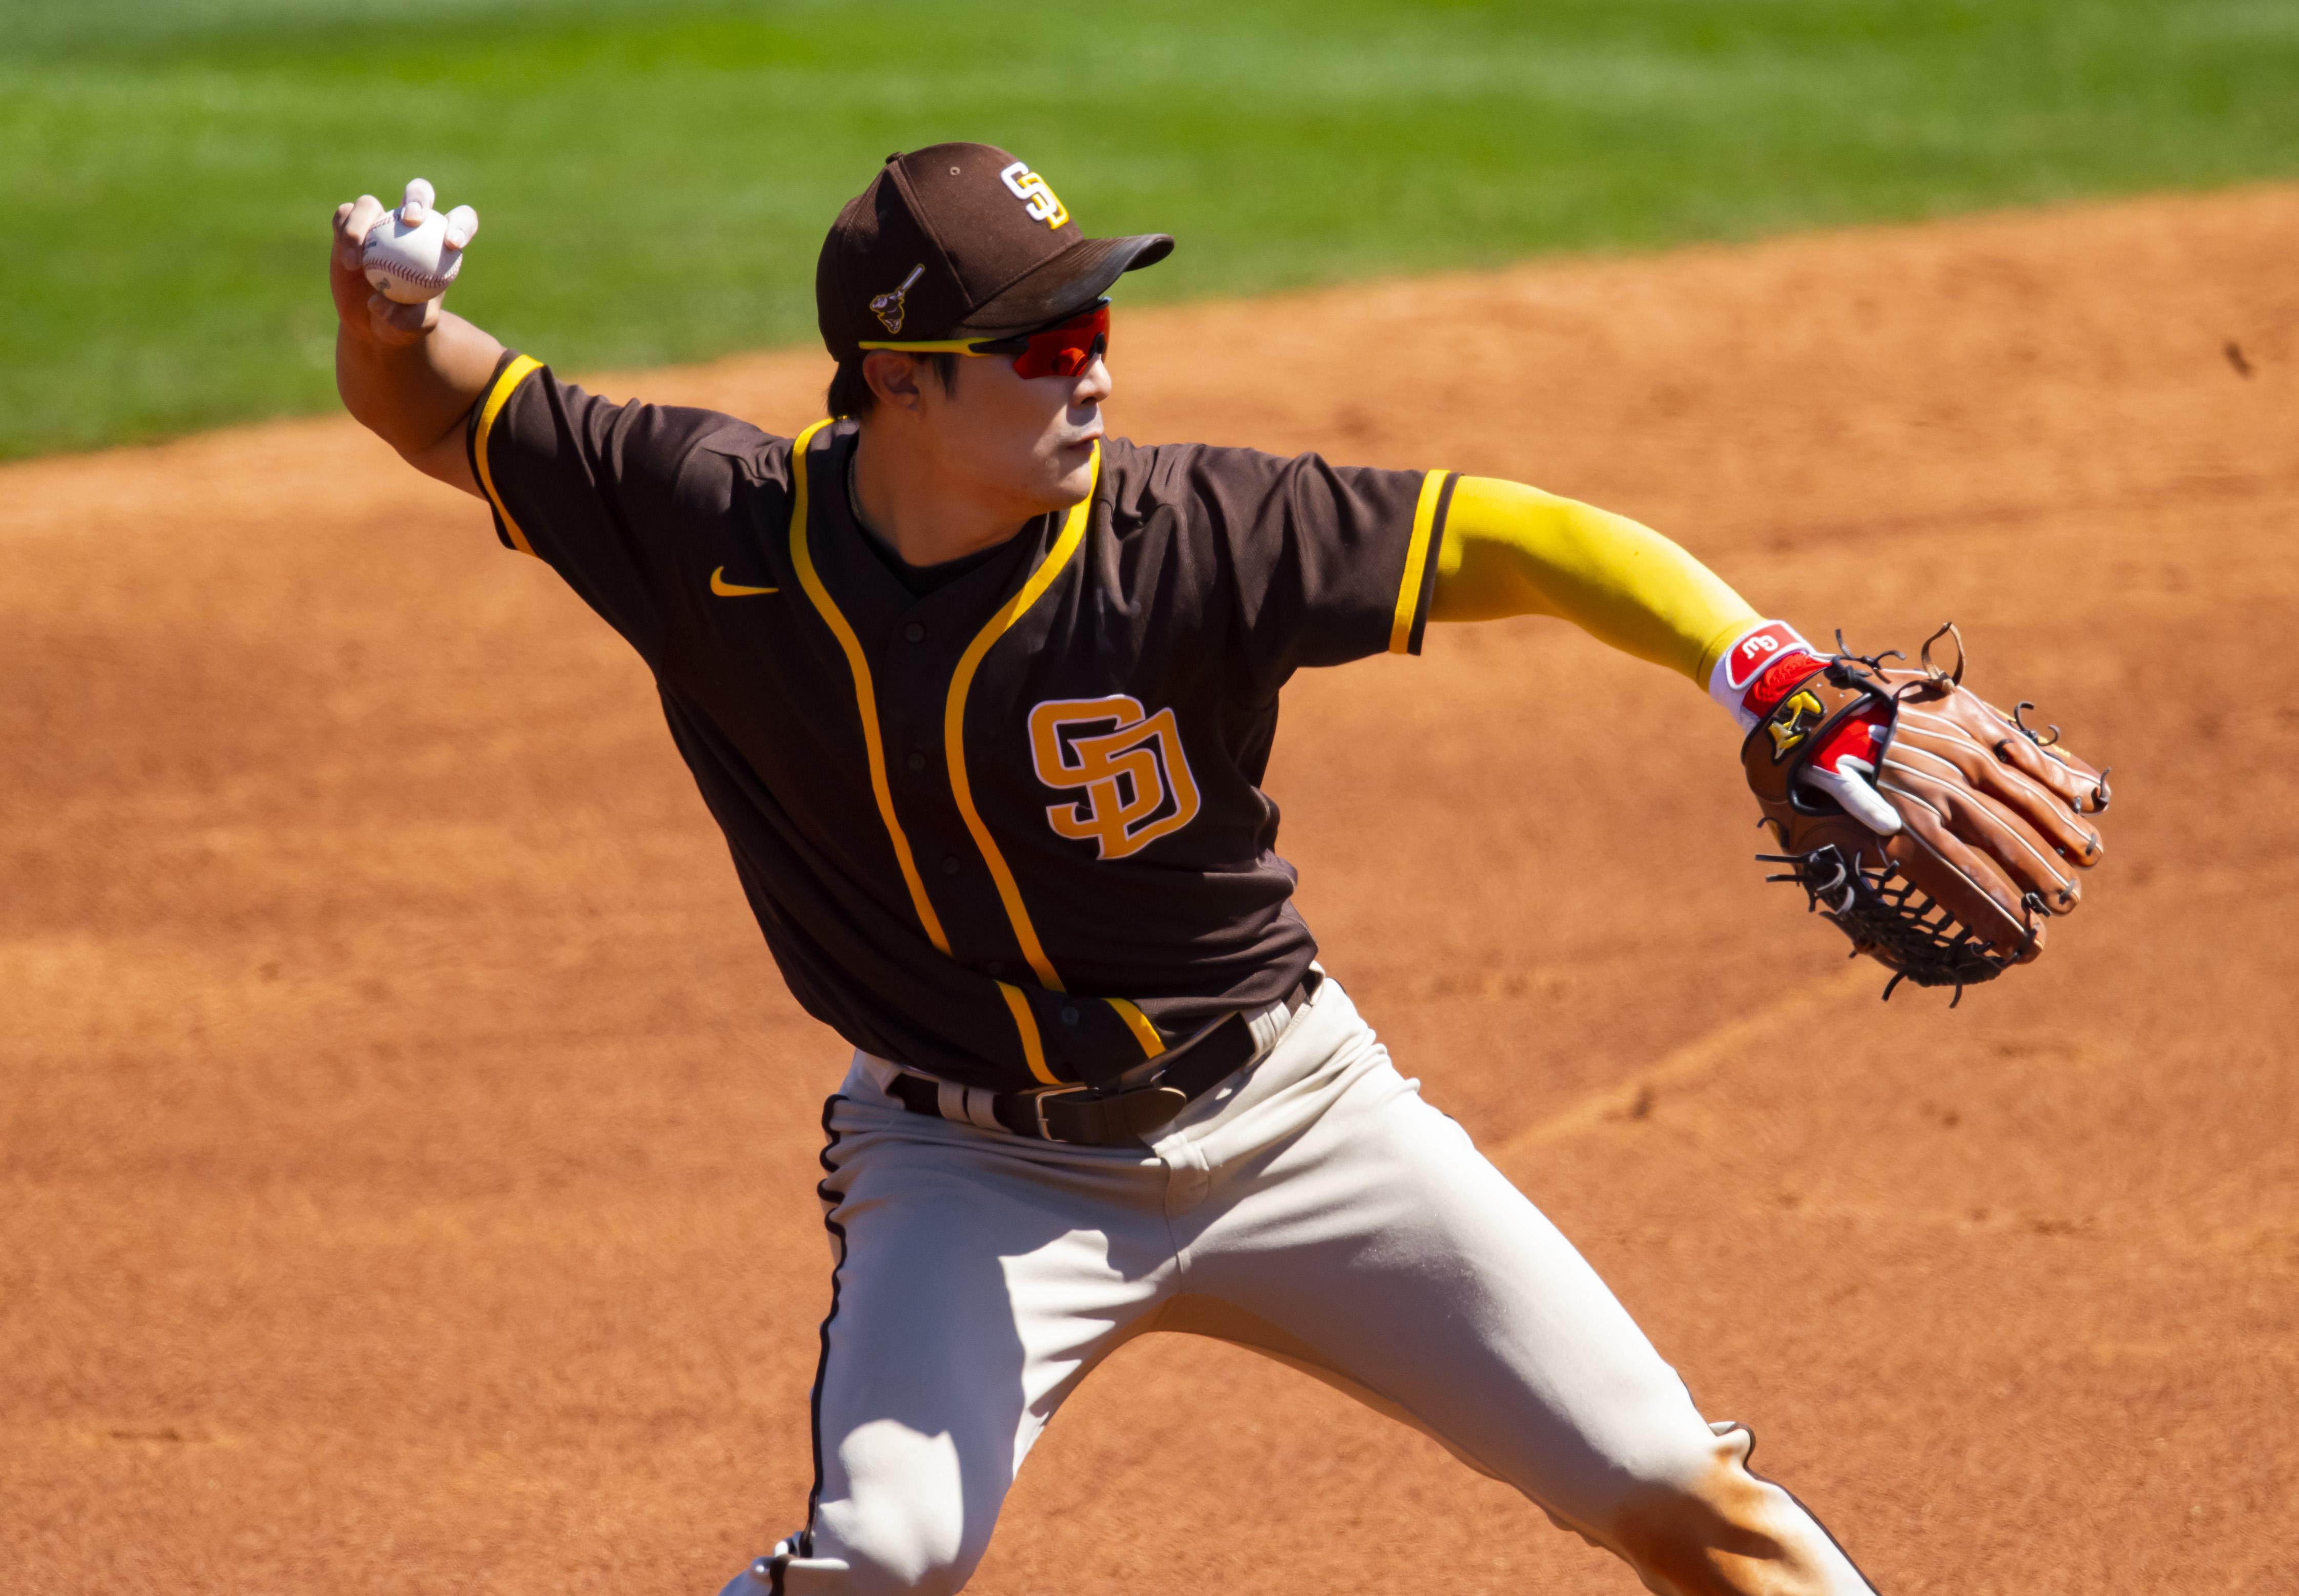 MLB: San Diego Padres at Los Angeles Angels